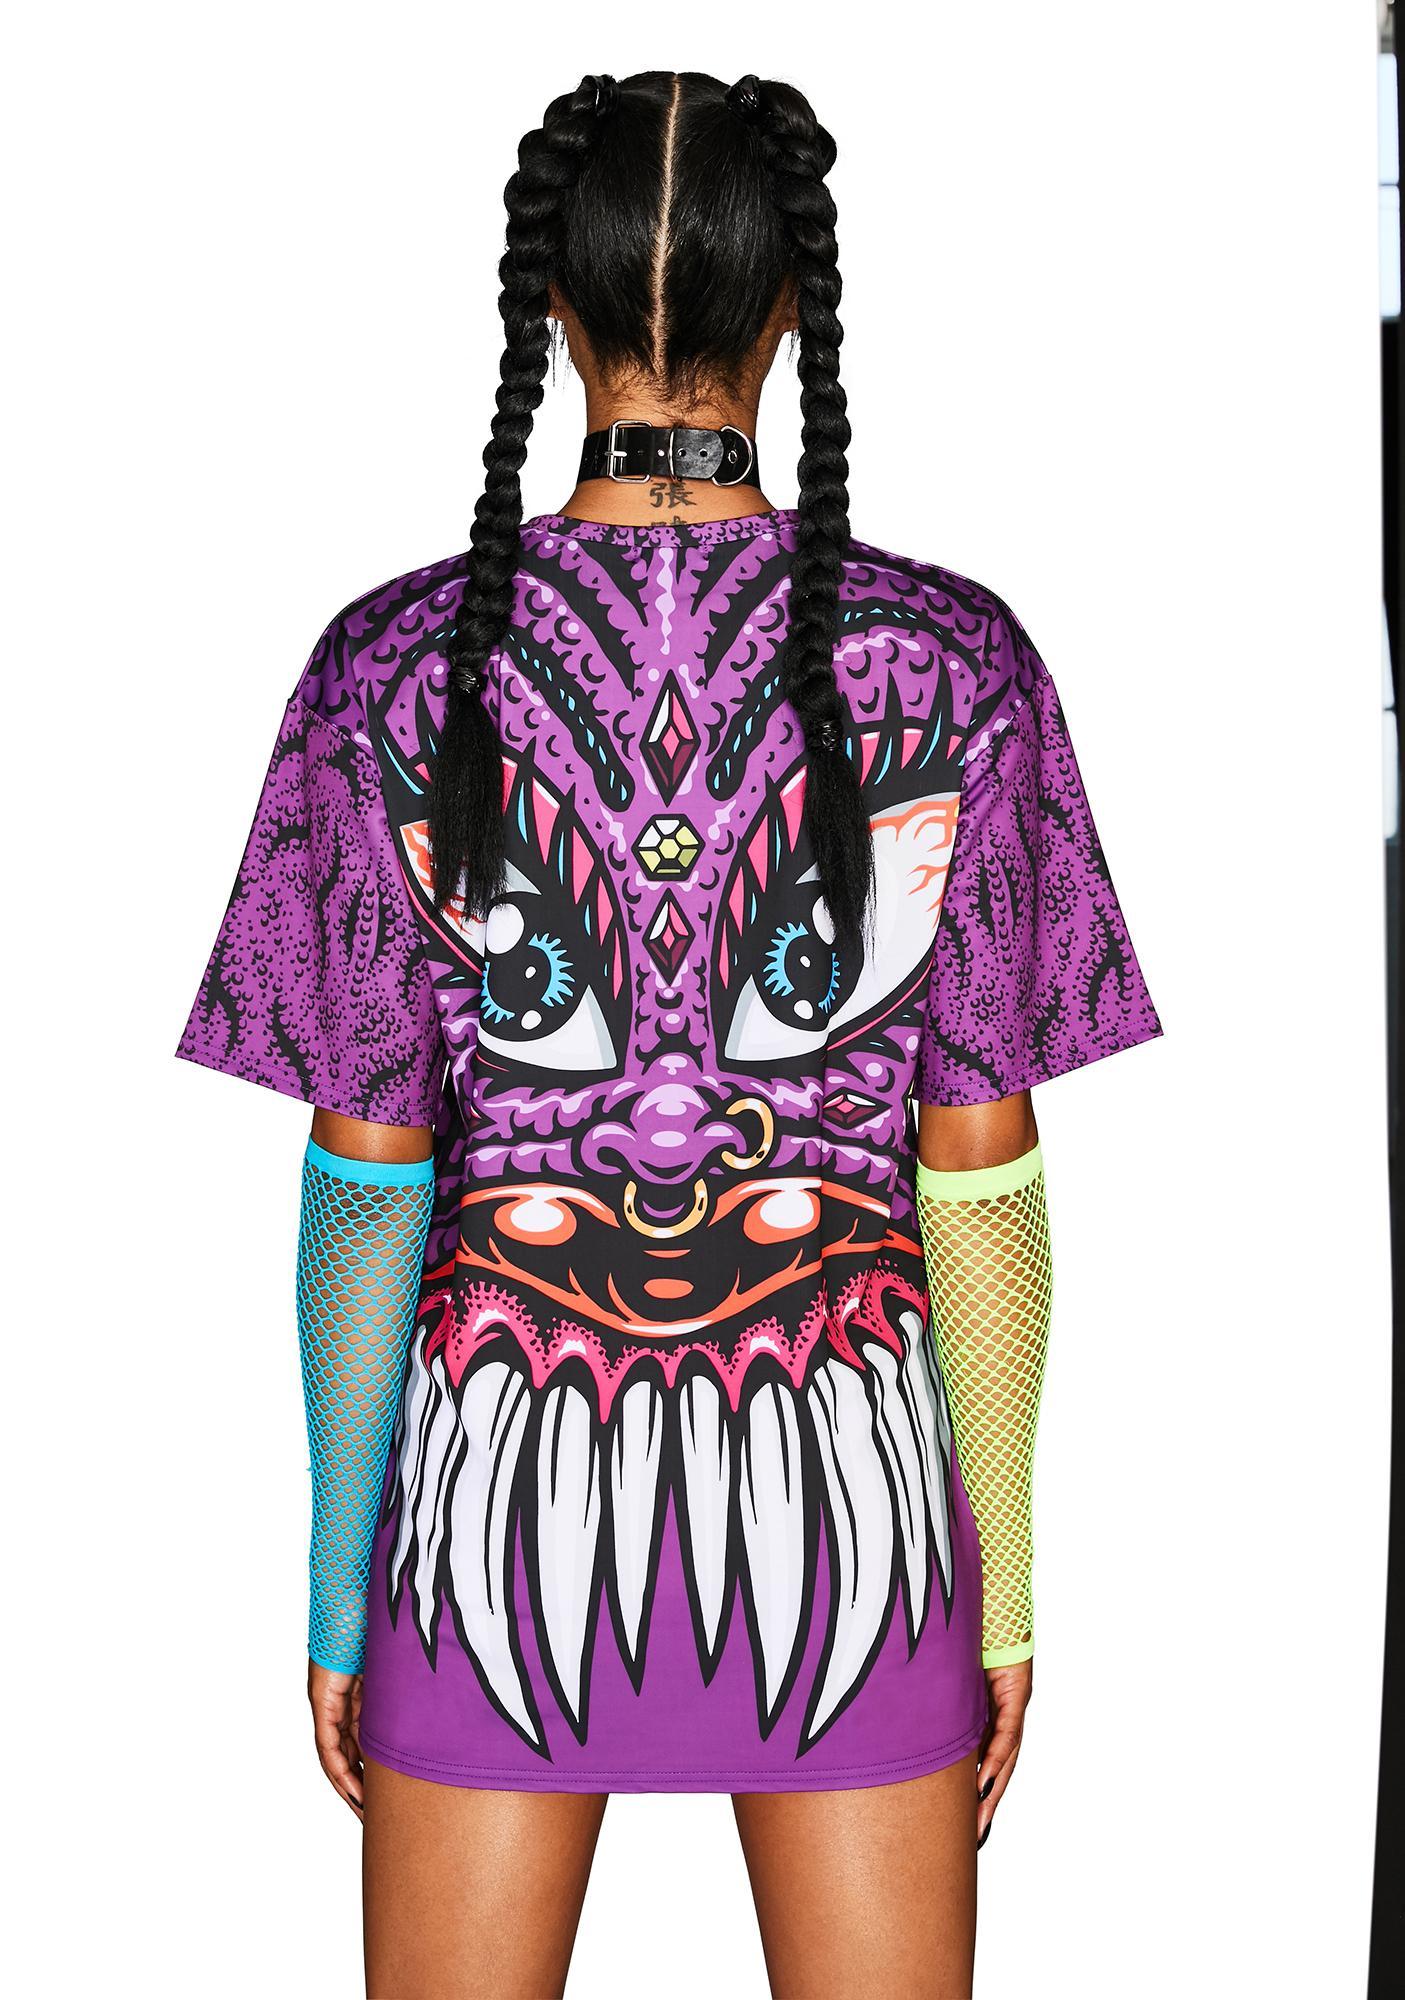 Club Exx Neon Nightmares Graphic Tee